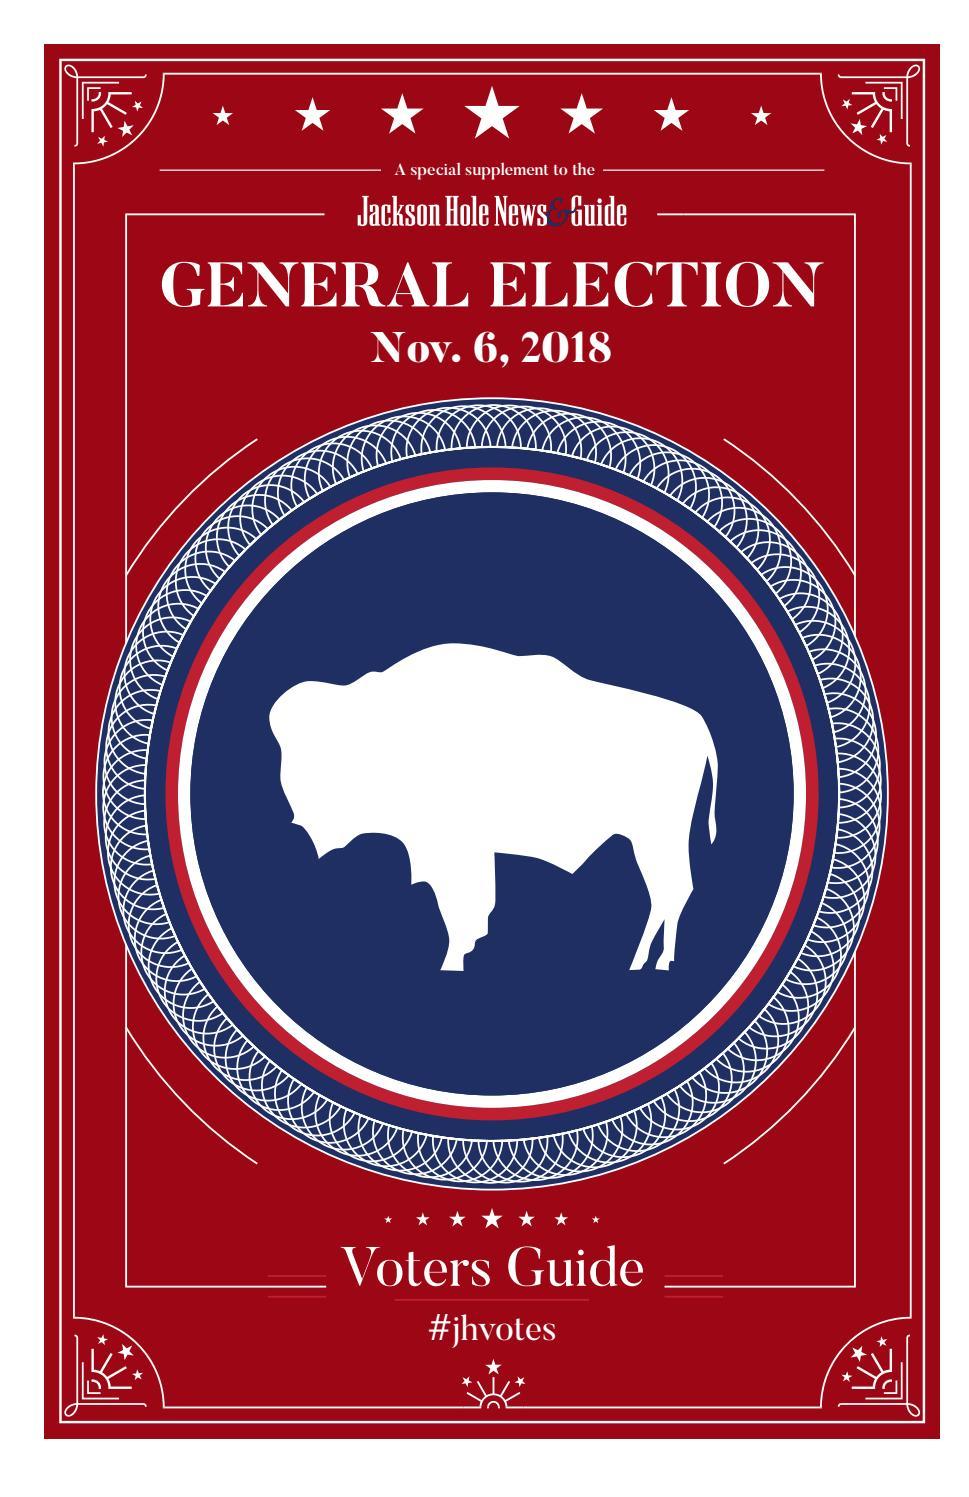 General Election 2018 by Teton Media Works, Inc  - issuu